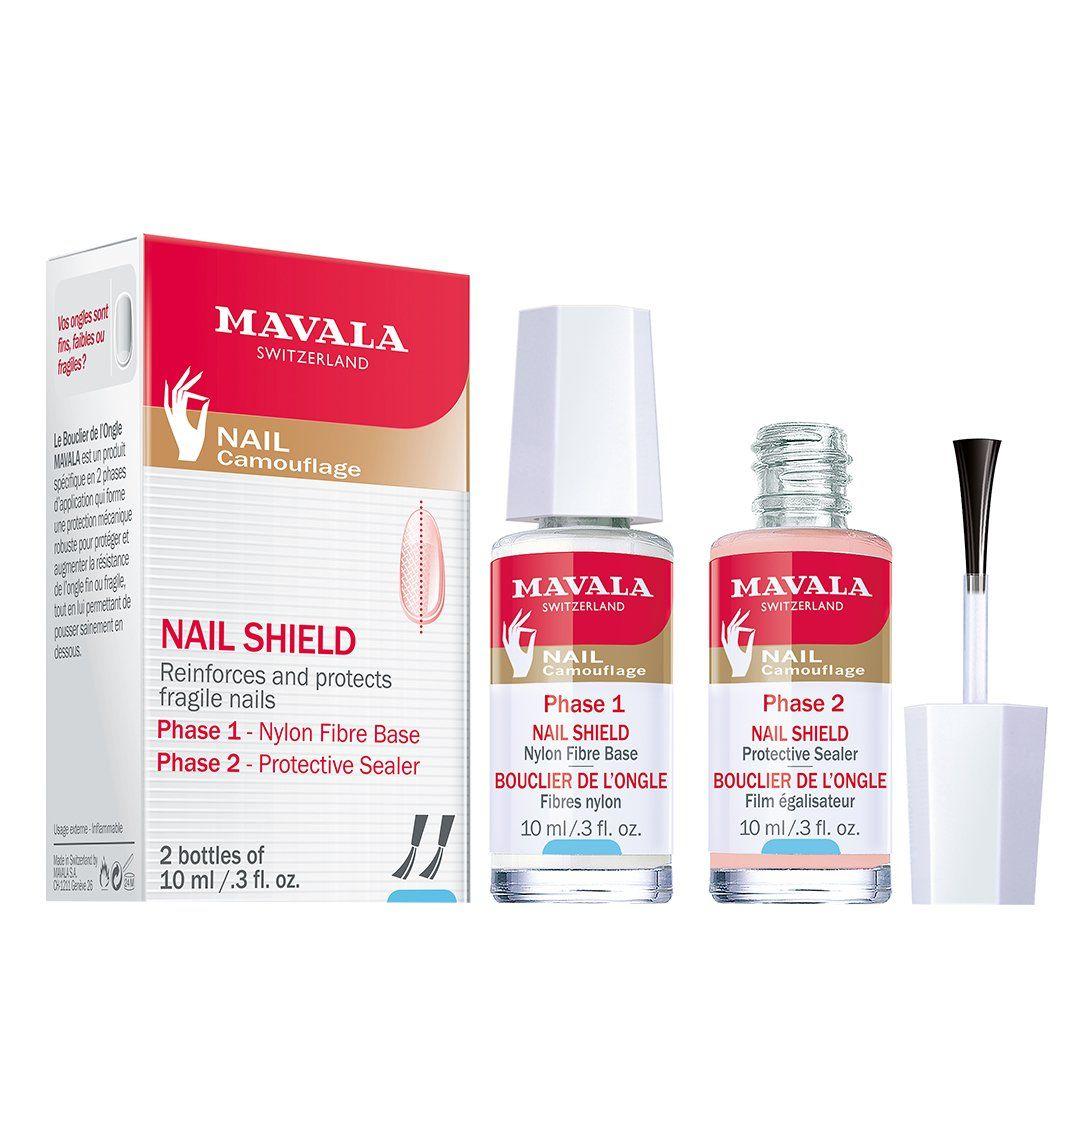 Mavala Nail Shield, 2 Count, Phase 1 & 2, Clear Nail Polish Top Coat, Nail Strengthener, Nail Growth & Nail Hardener Treatment, Nail Care and Repair for Brittle or Split Nails